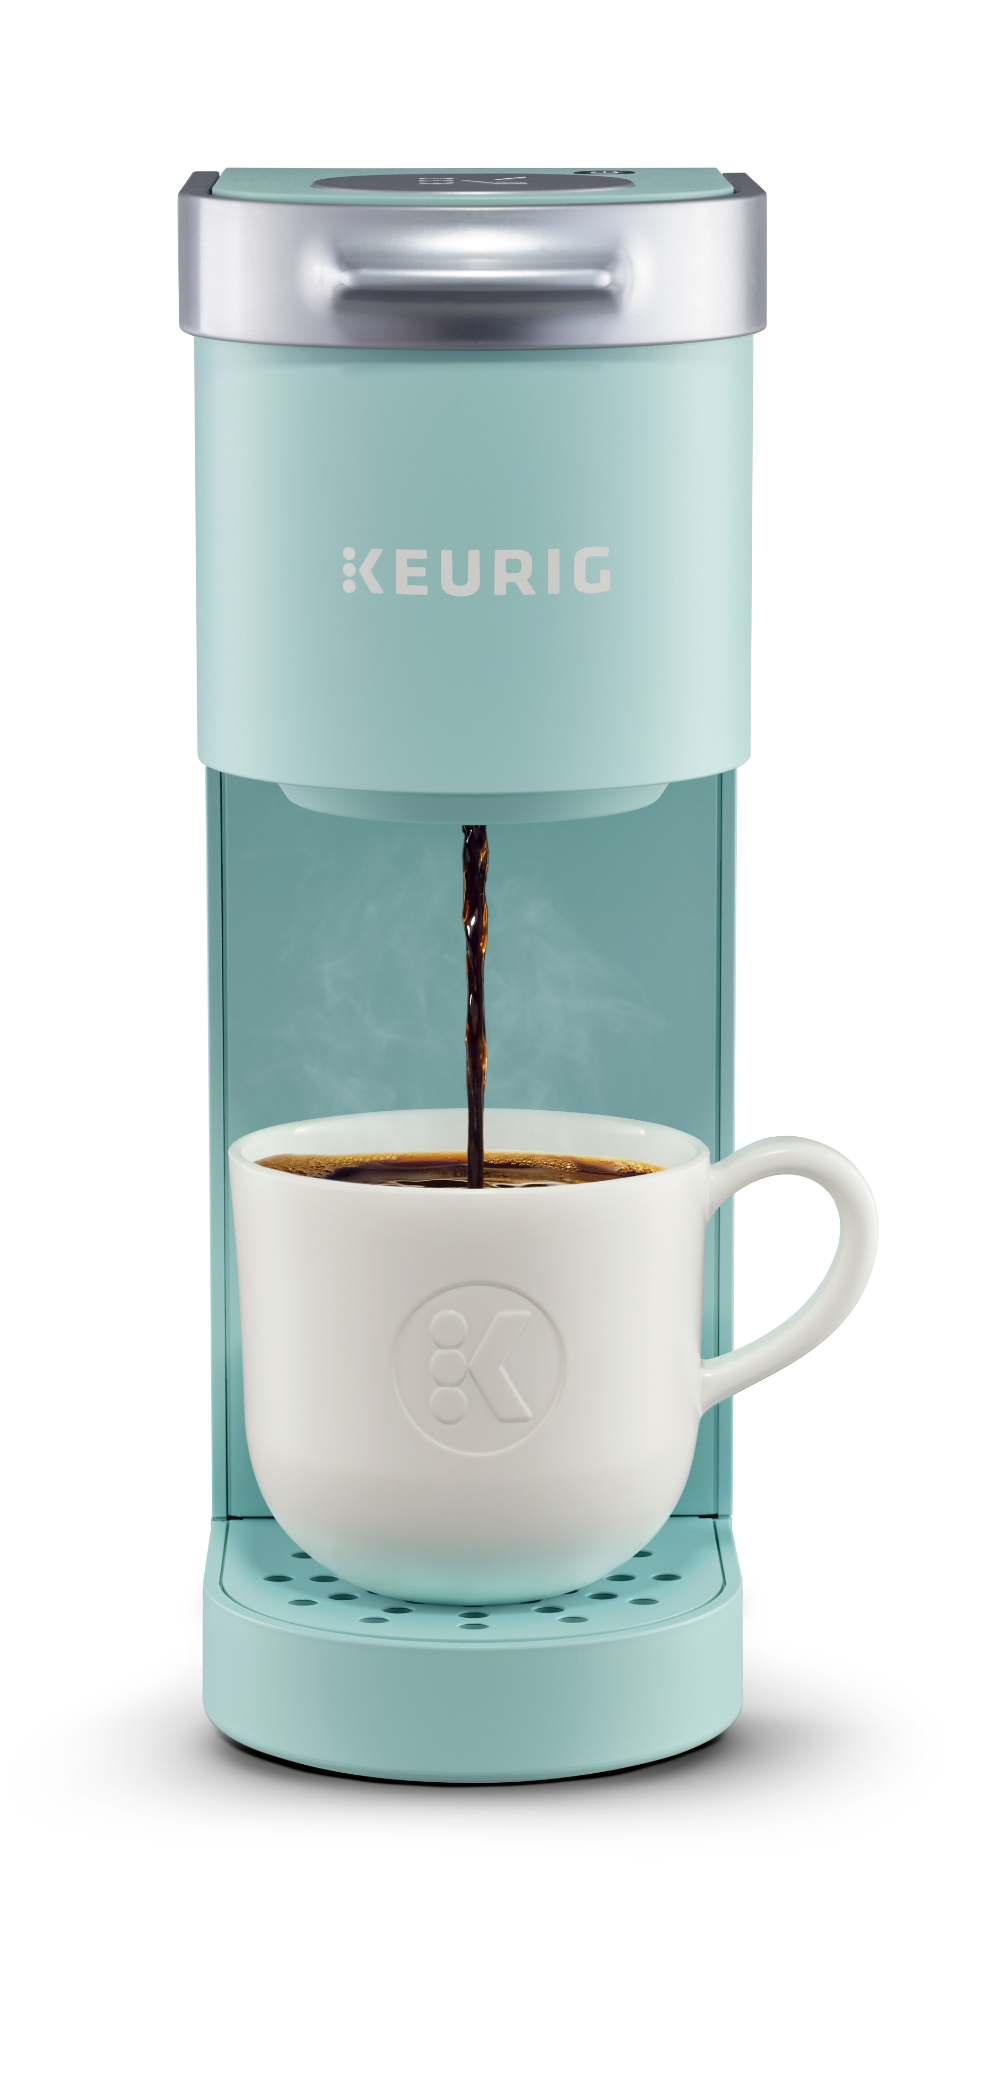 Keurig KMini Single Serve KCup Pod Coffee Maker, 6 to 12